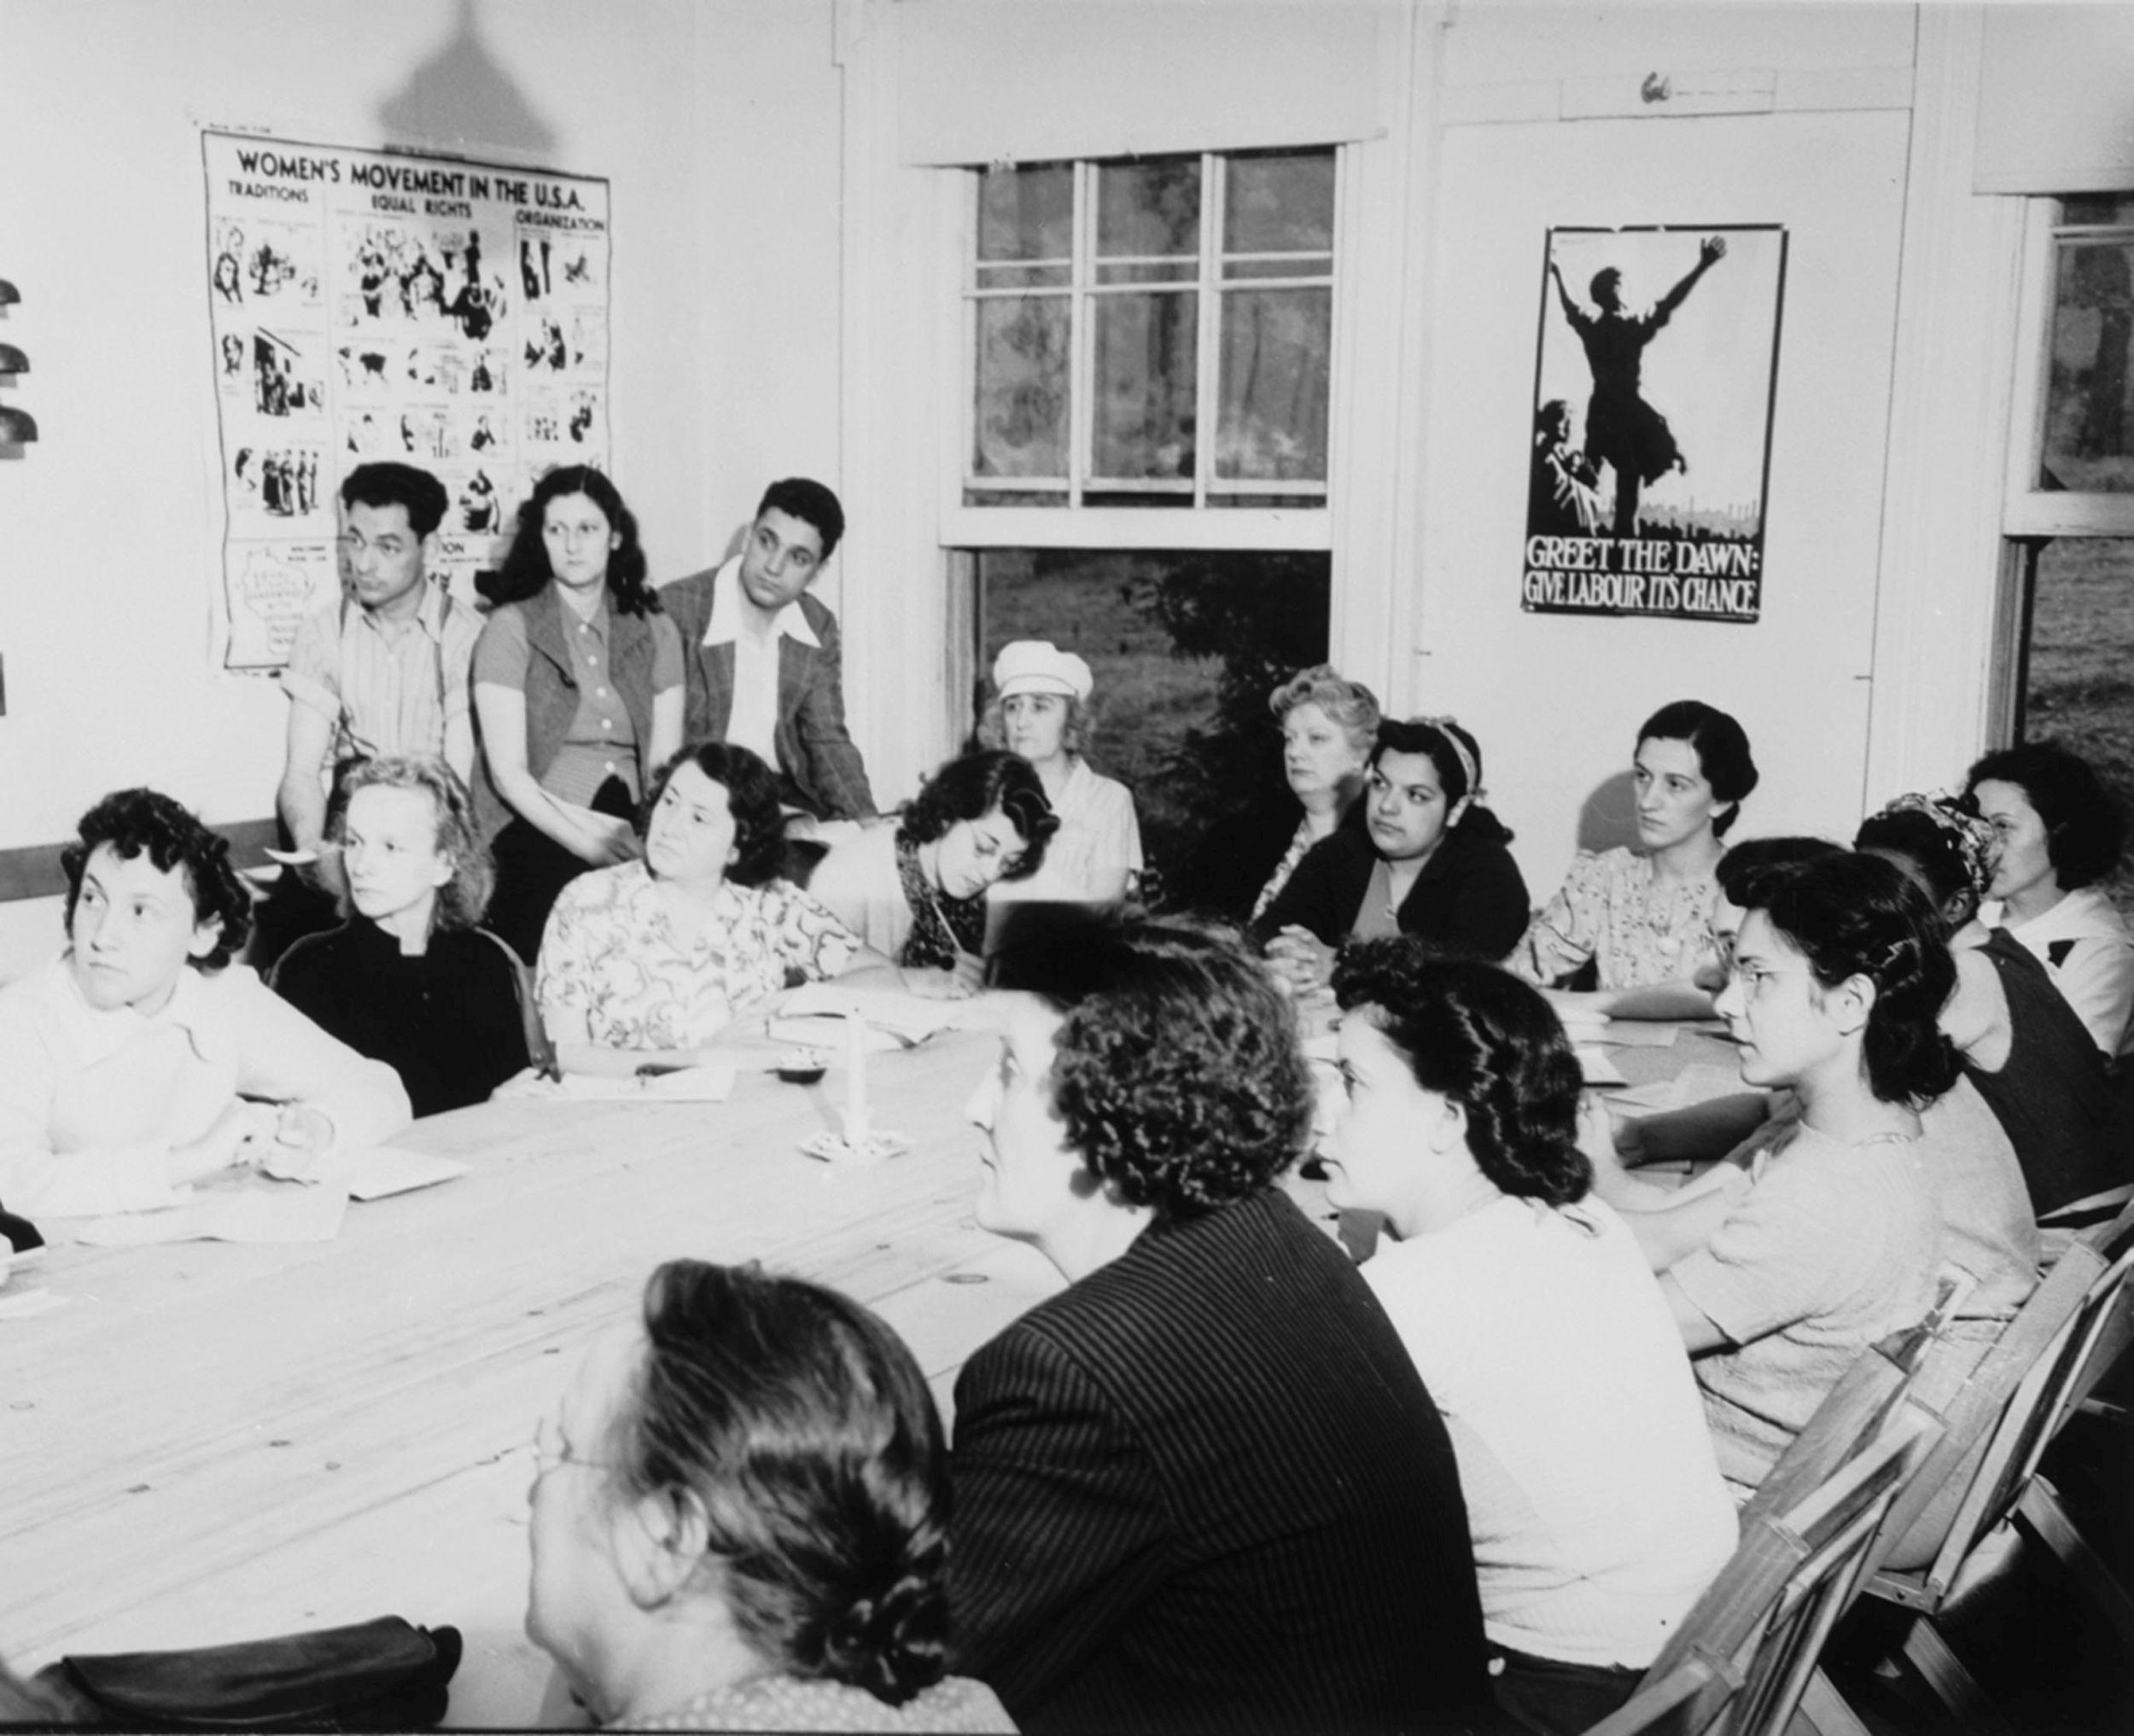 Nieformalne spotkanie członkin ruchu kobiecego w USA; International Information Centre and Archives for Women's Movement (fot. Kheel Center / Flickr.com / CC BY-SA 2.0 / bit.ly/1mhaR6e)